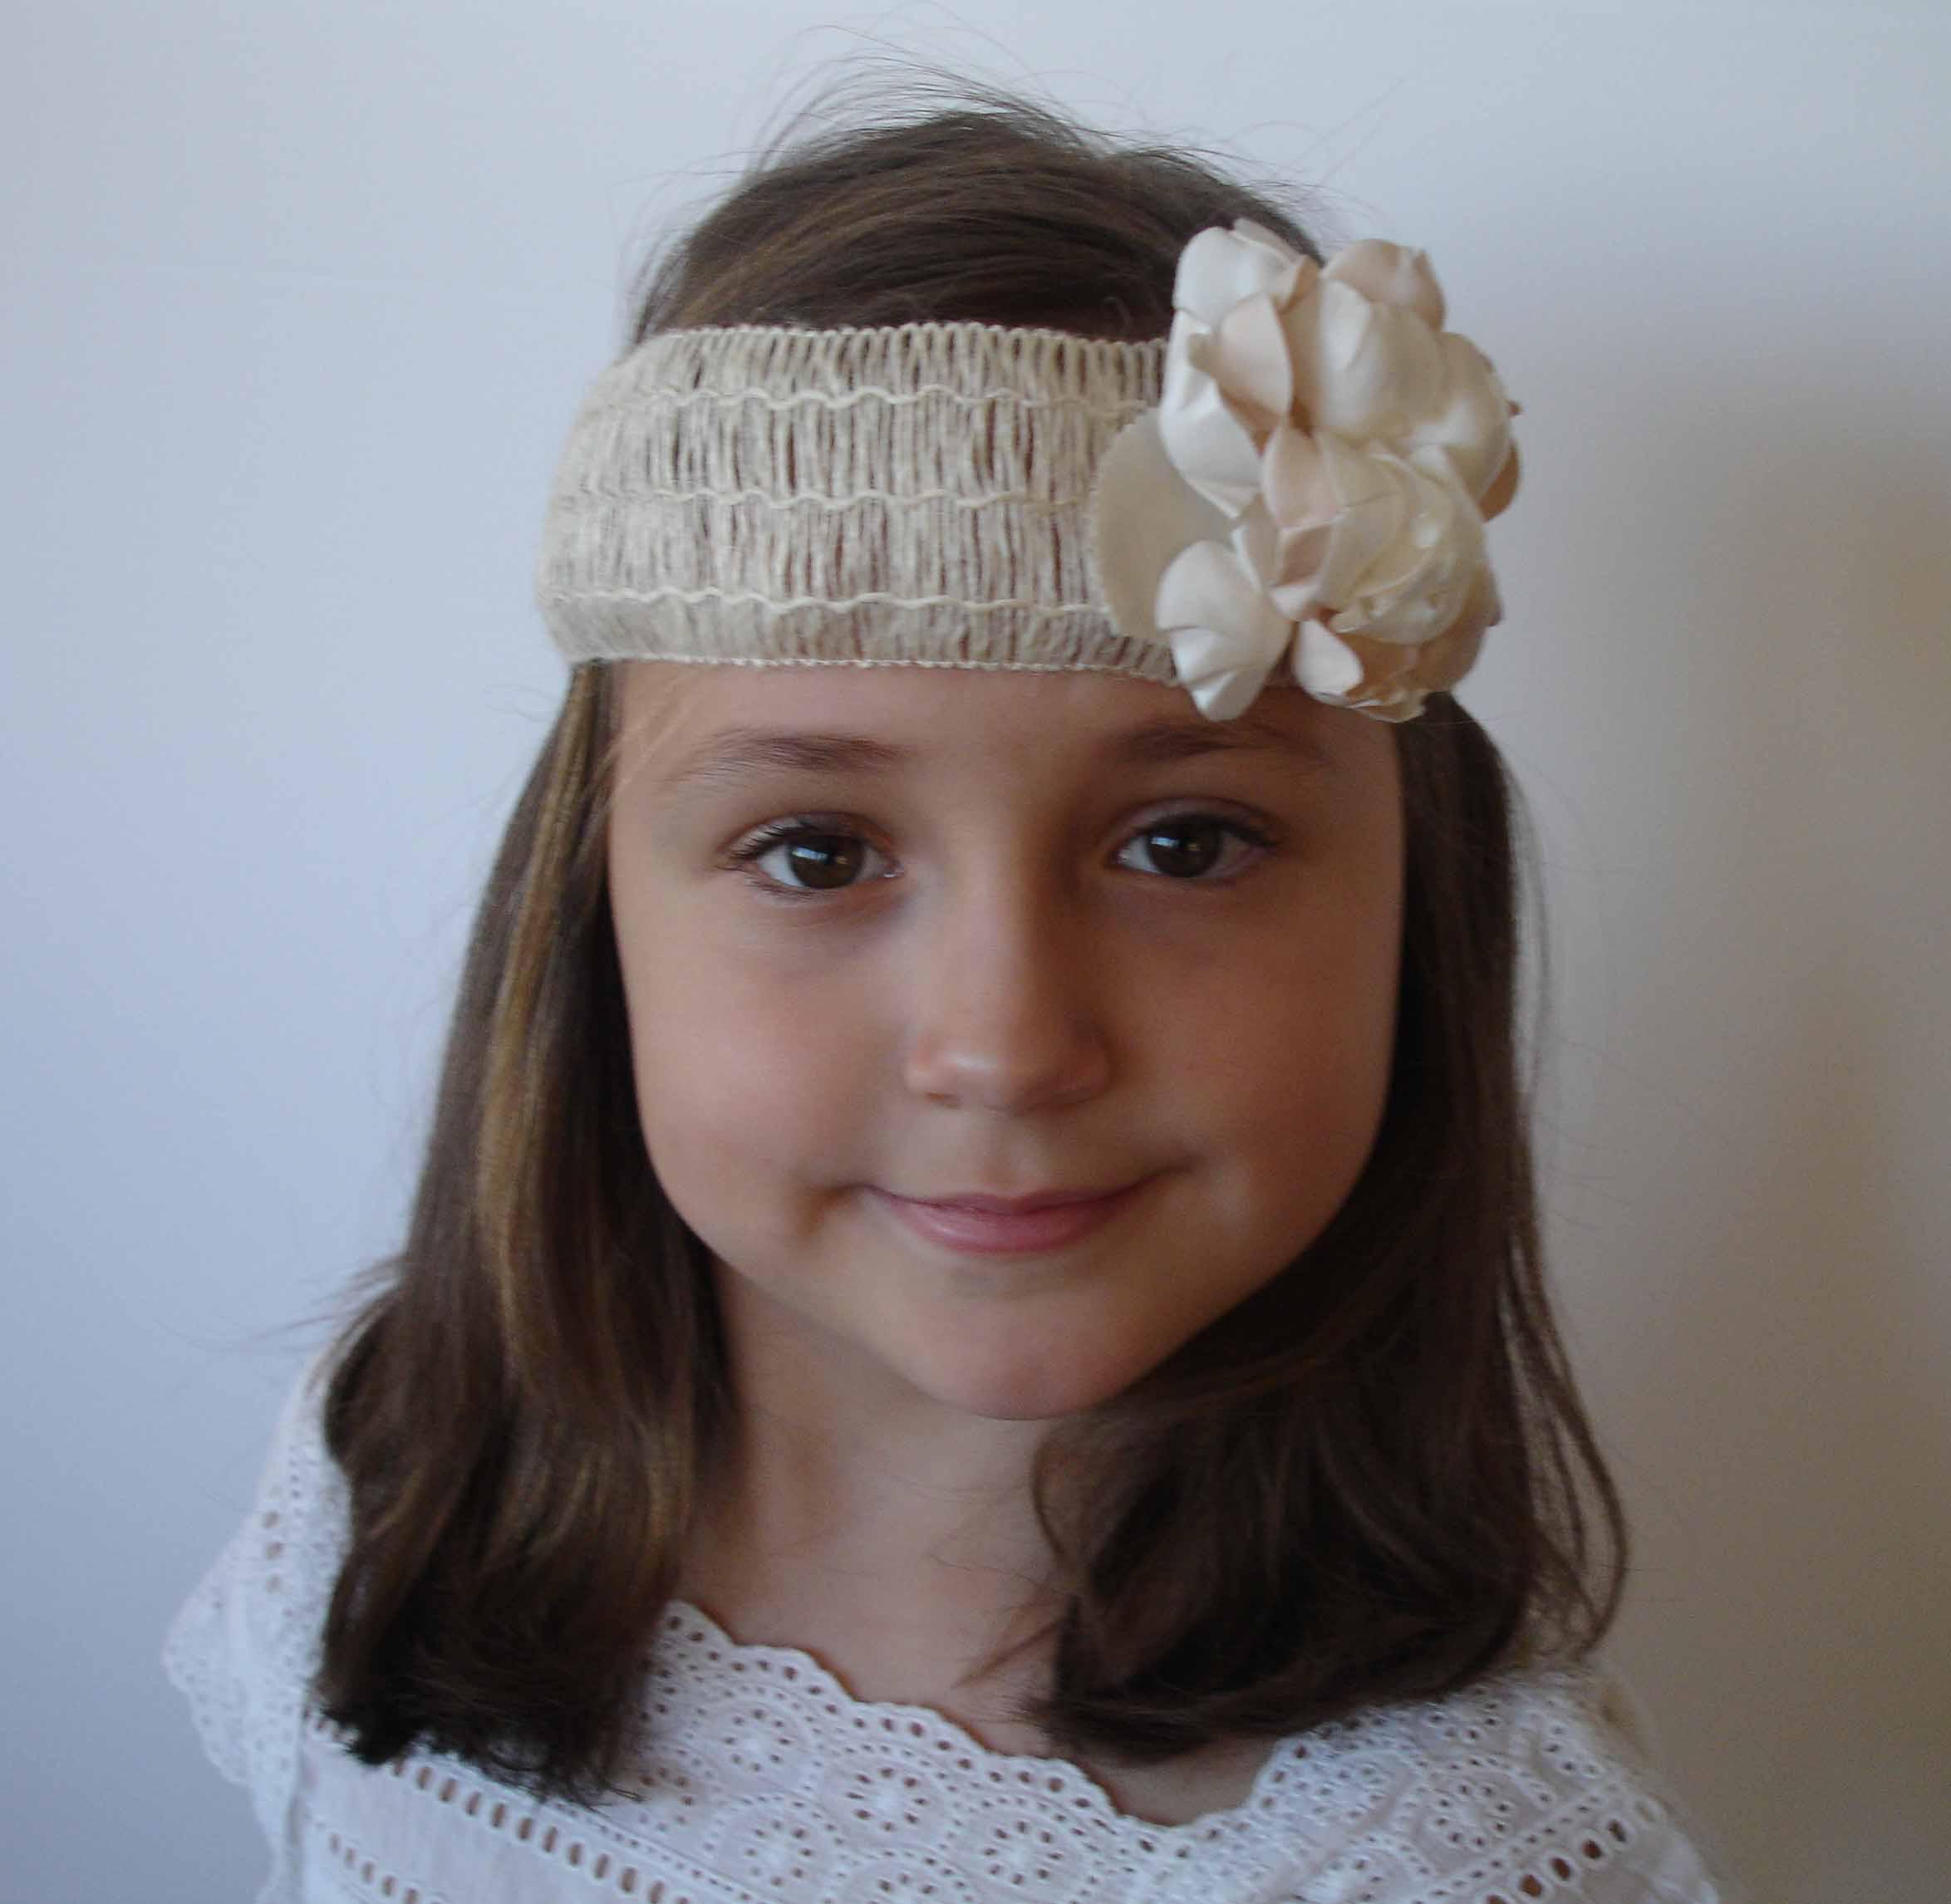 turbante rafia y flor valeria 5